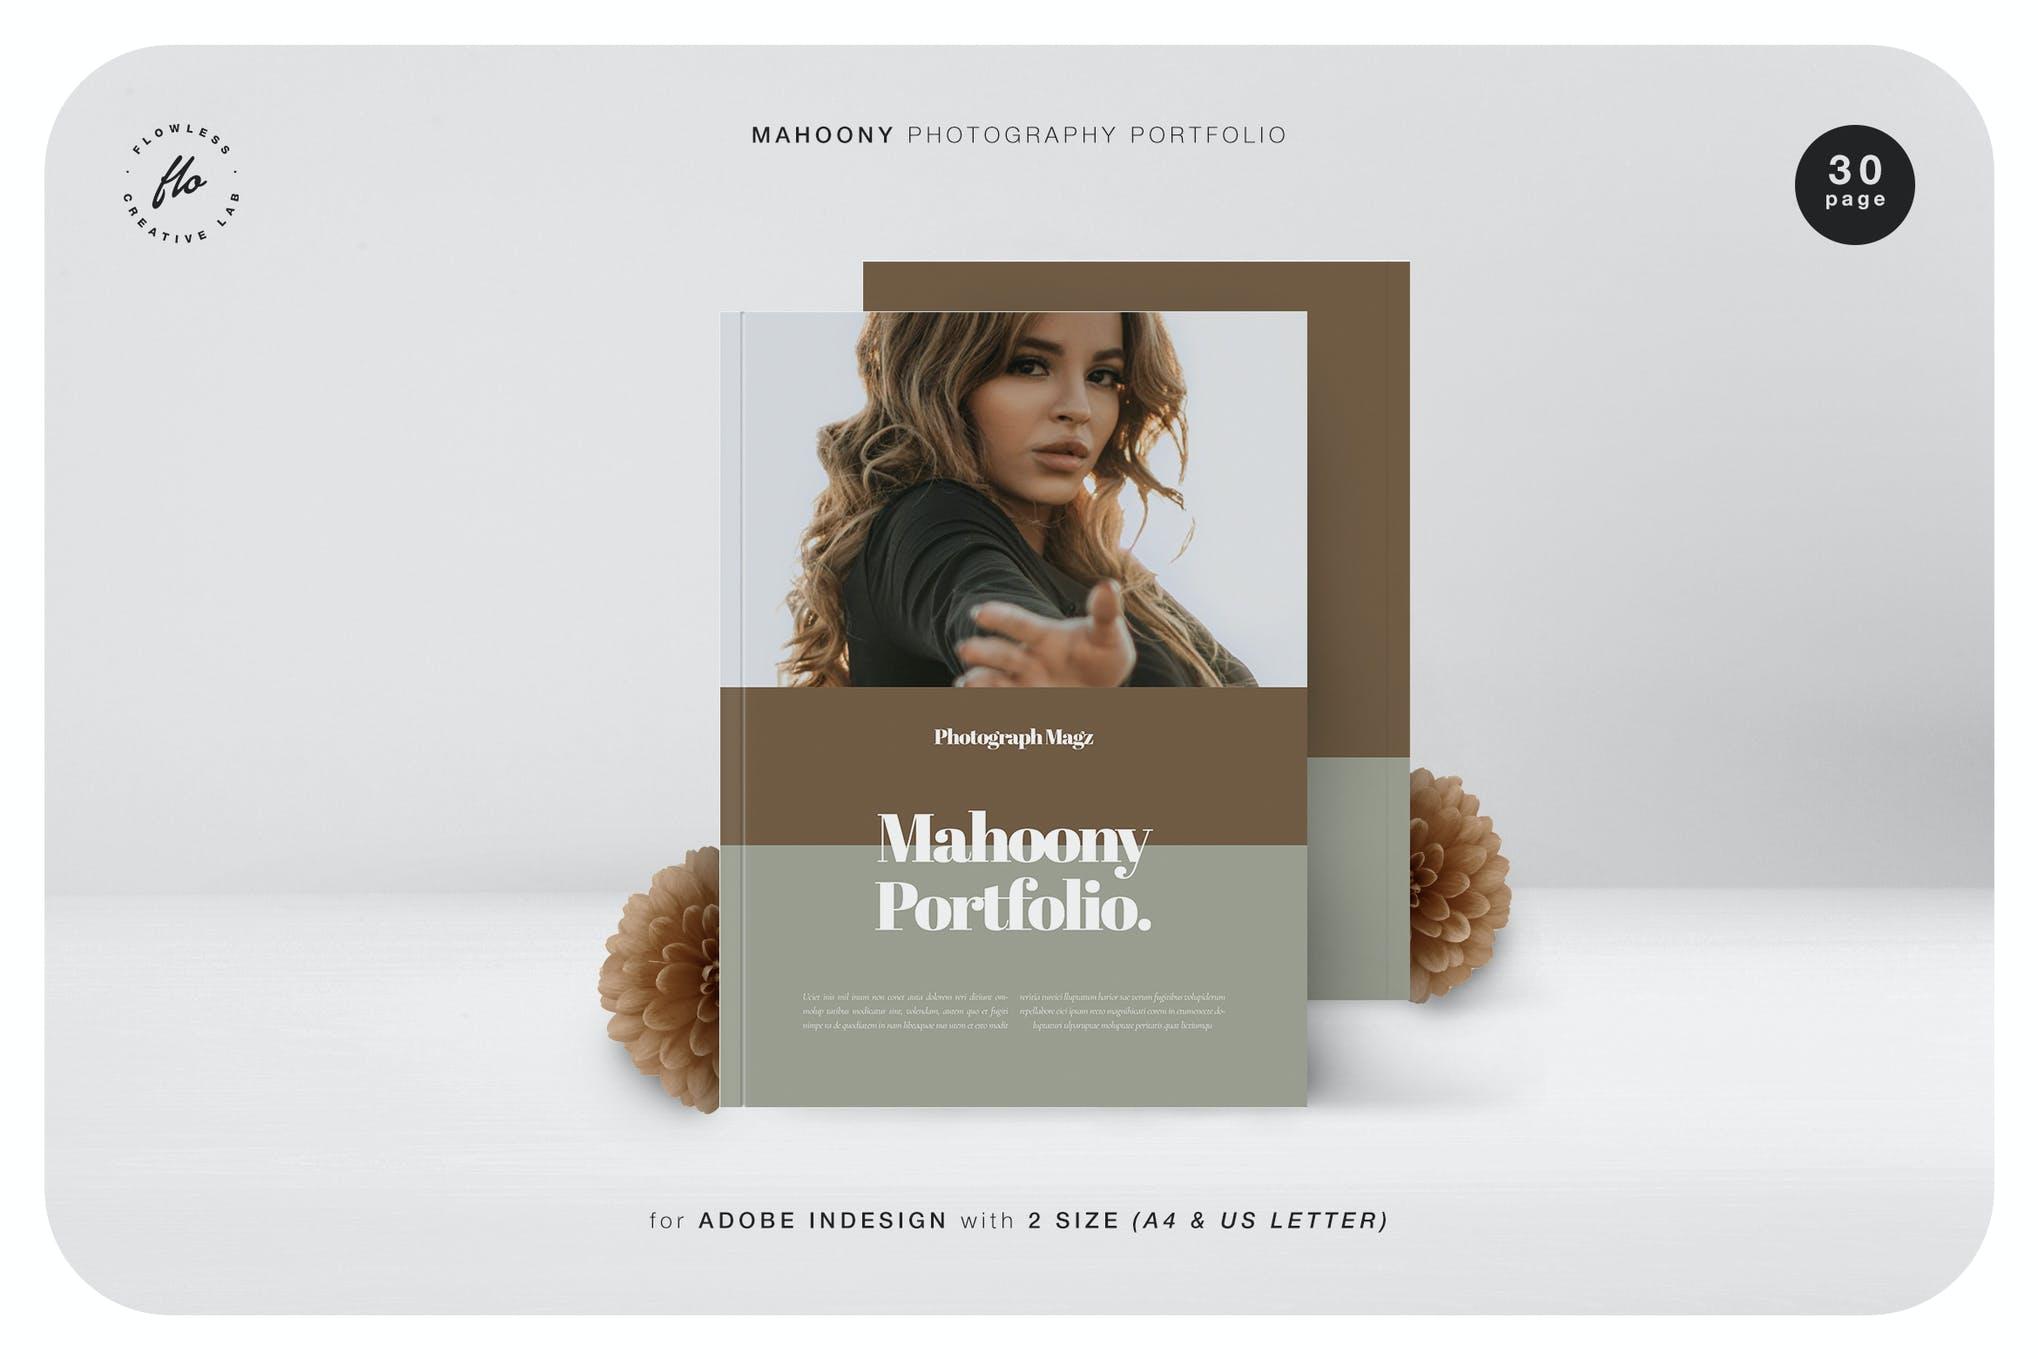 服装摄影作品集排版杂志INDD素材模板 Mahoony Photography Portfolio插图